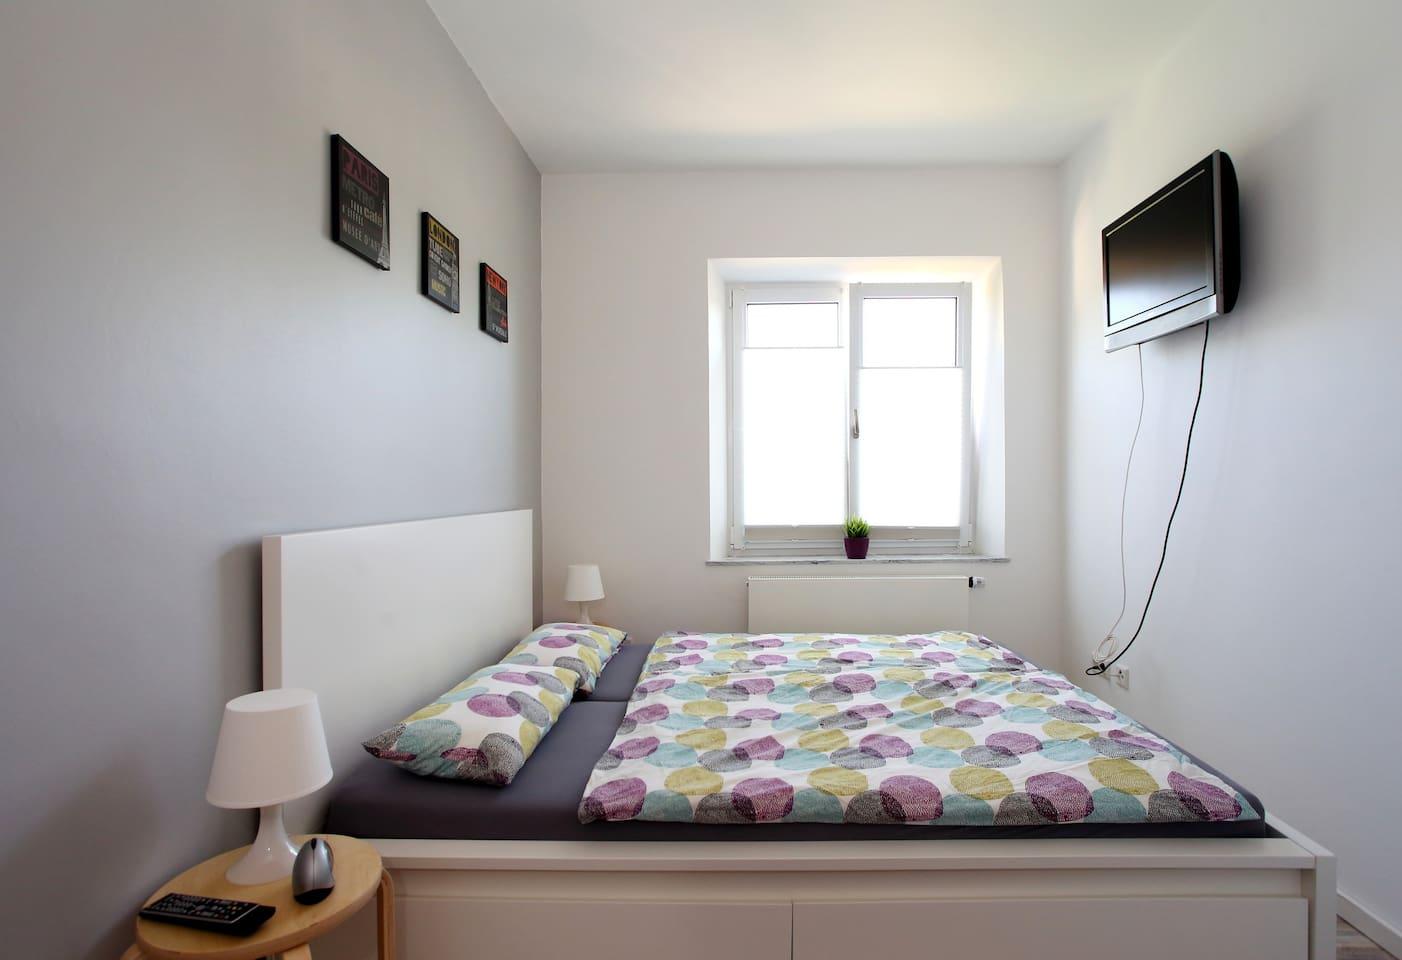 Schlafzimmer mit TV (Kabel) bedroom with TV